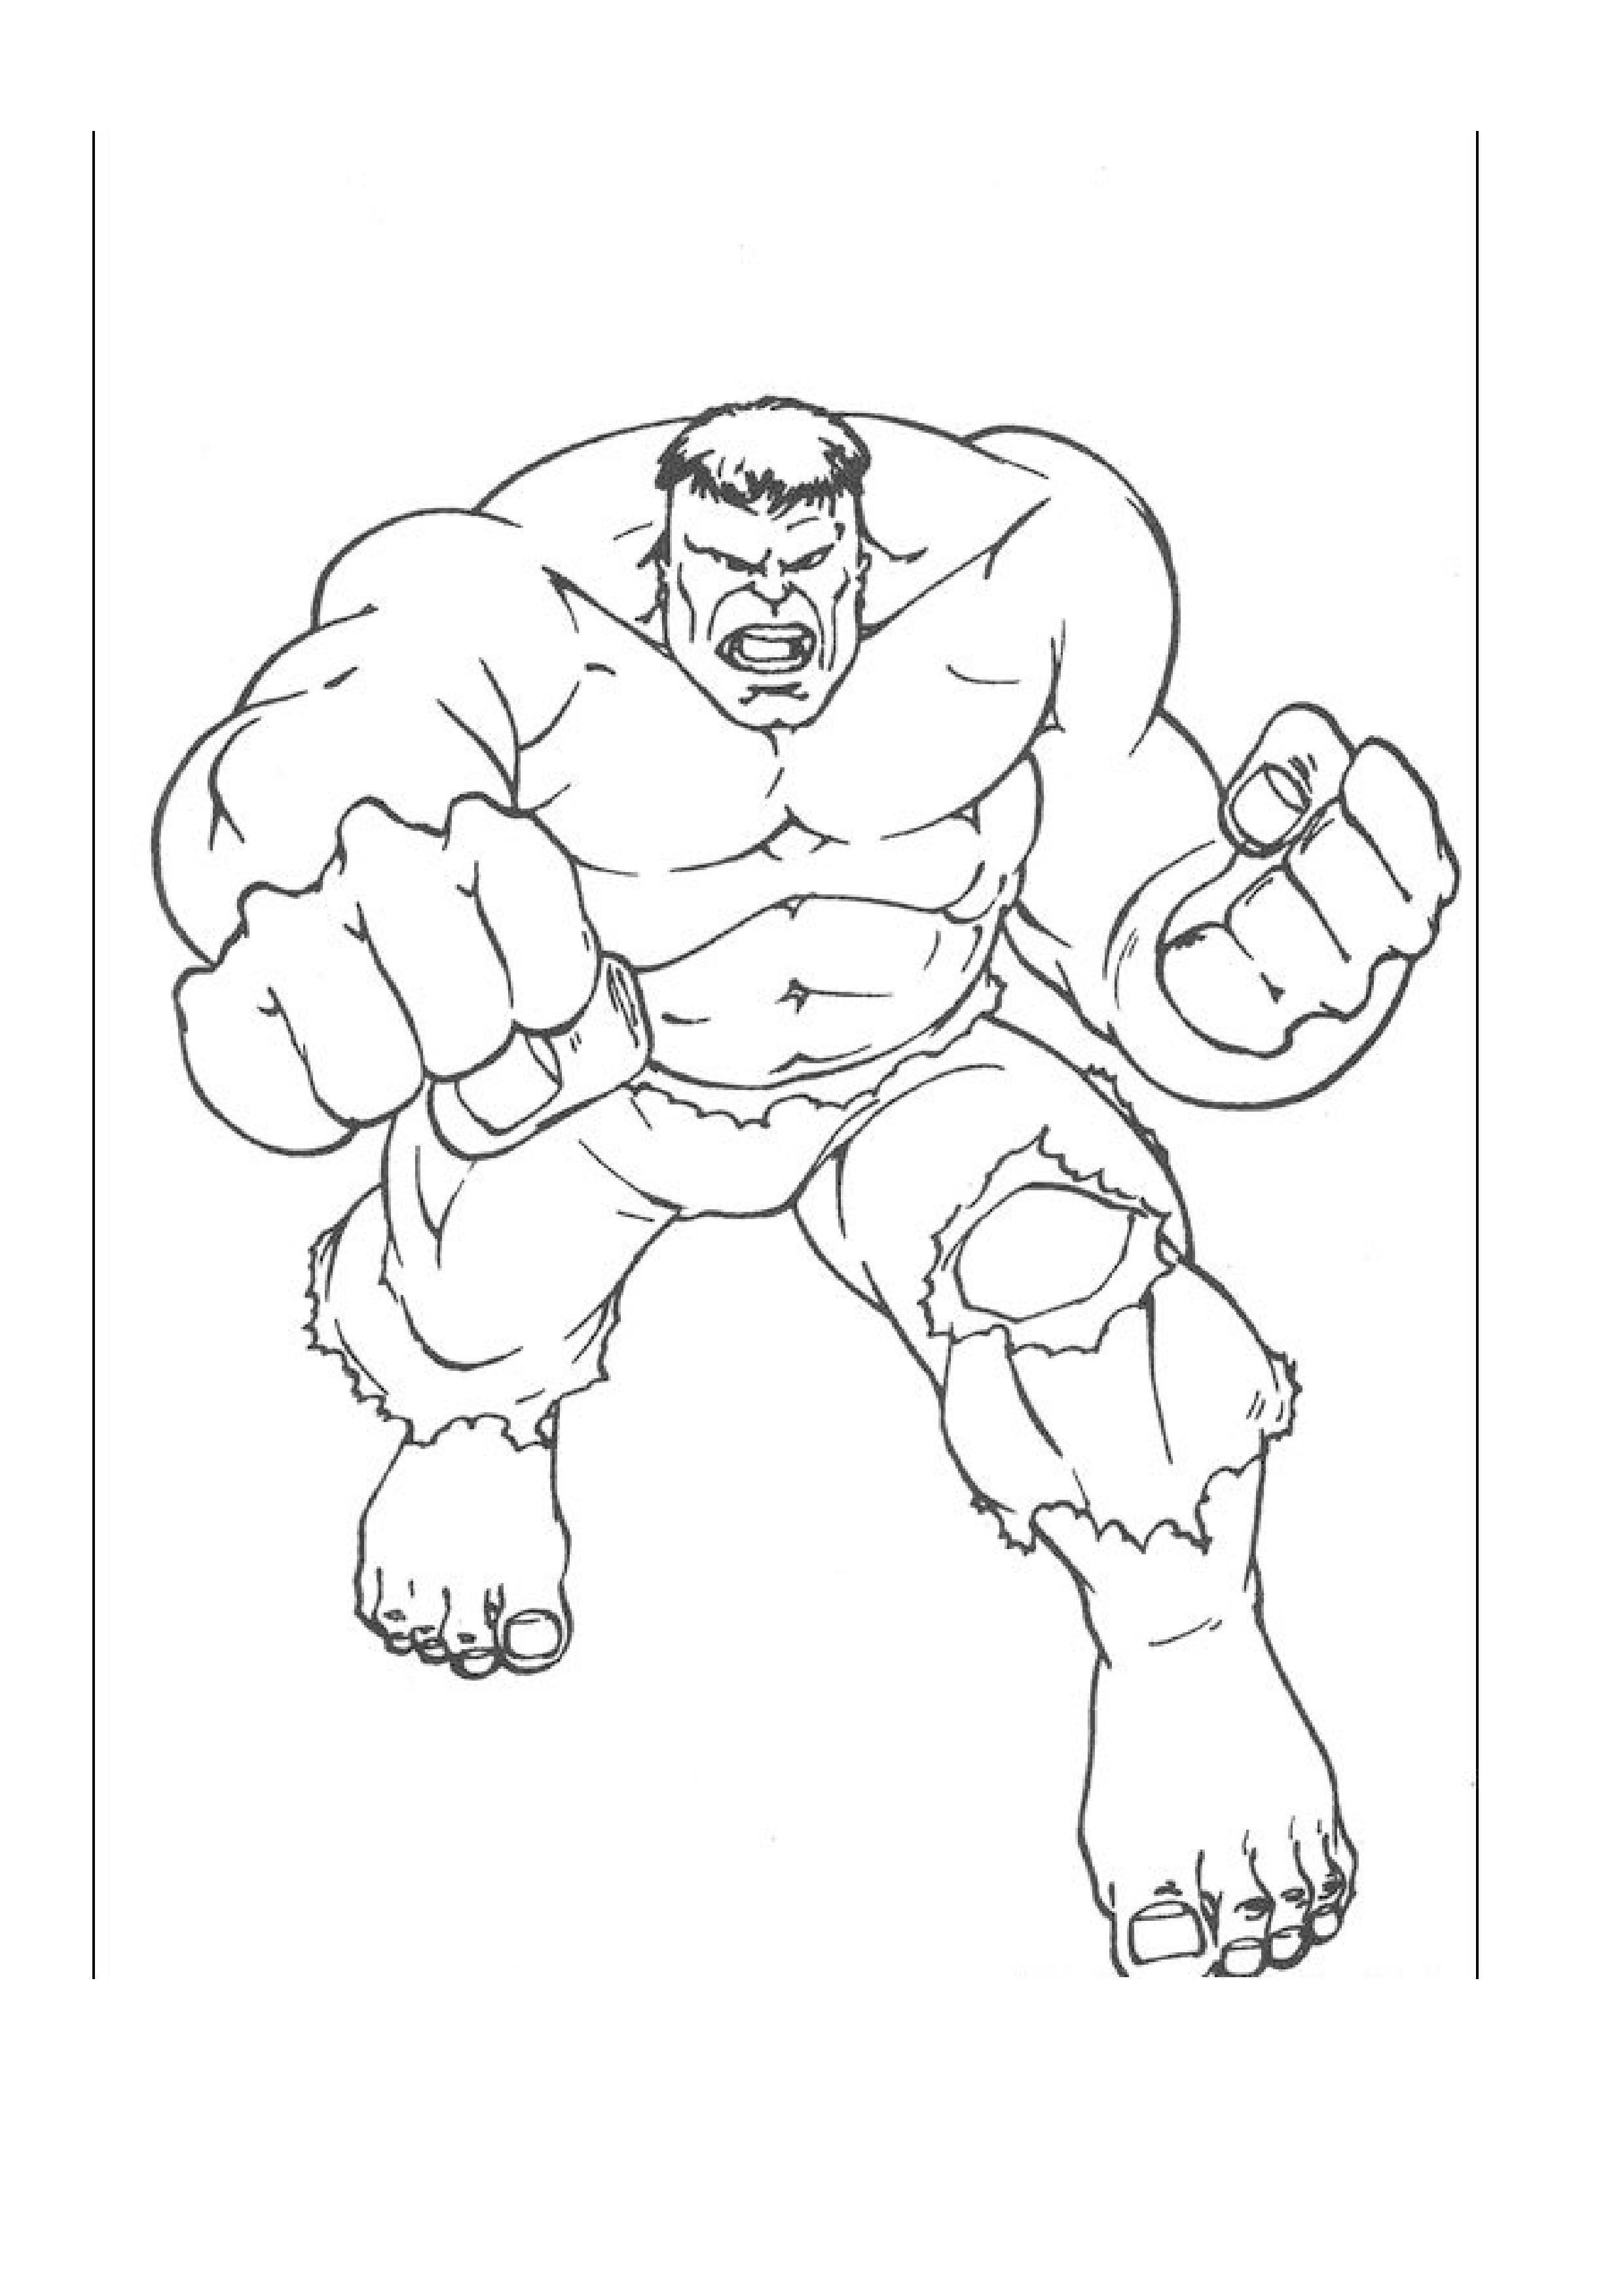 Marvel Helden Ausmalbilder Neu Superhelden Zum Ausmalen De Hellokids Genial Ausmalbilder Marvel Bild